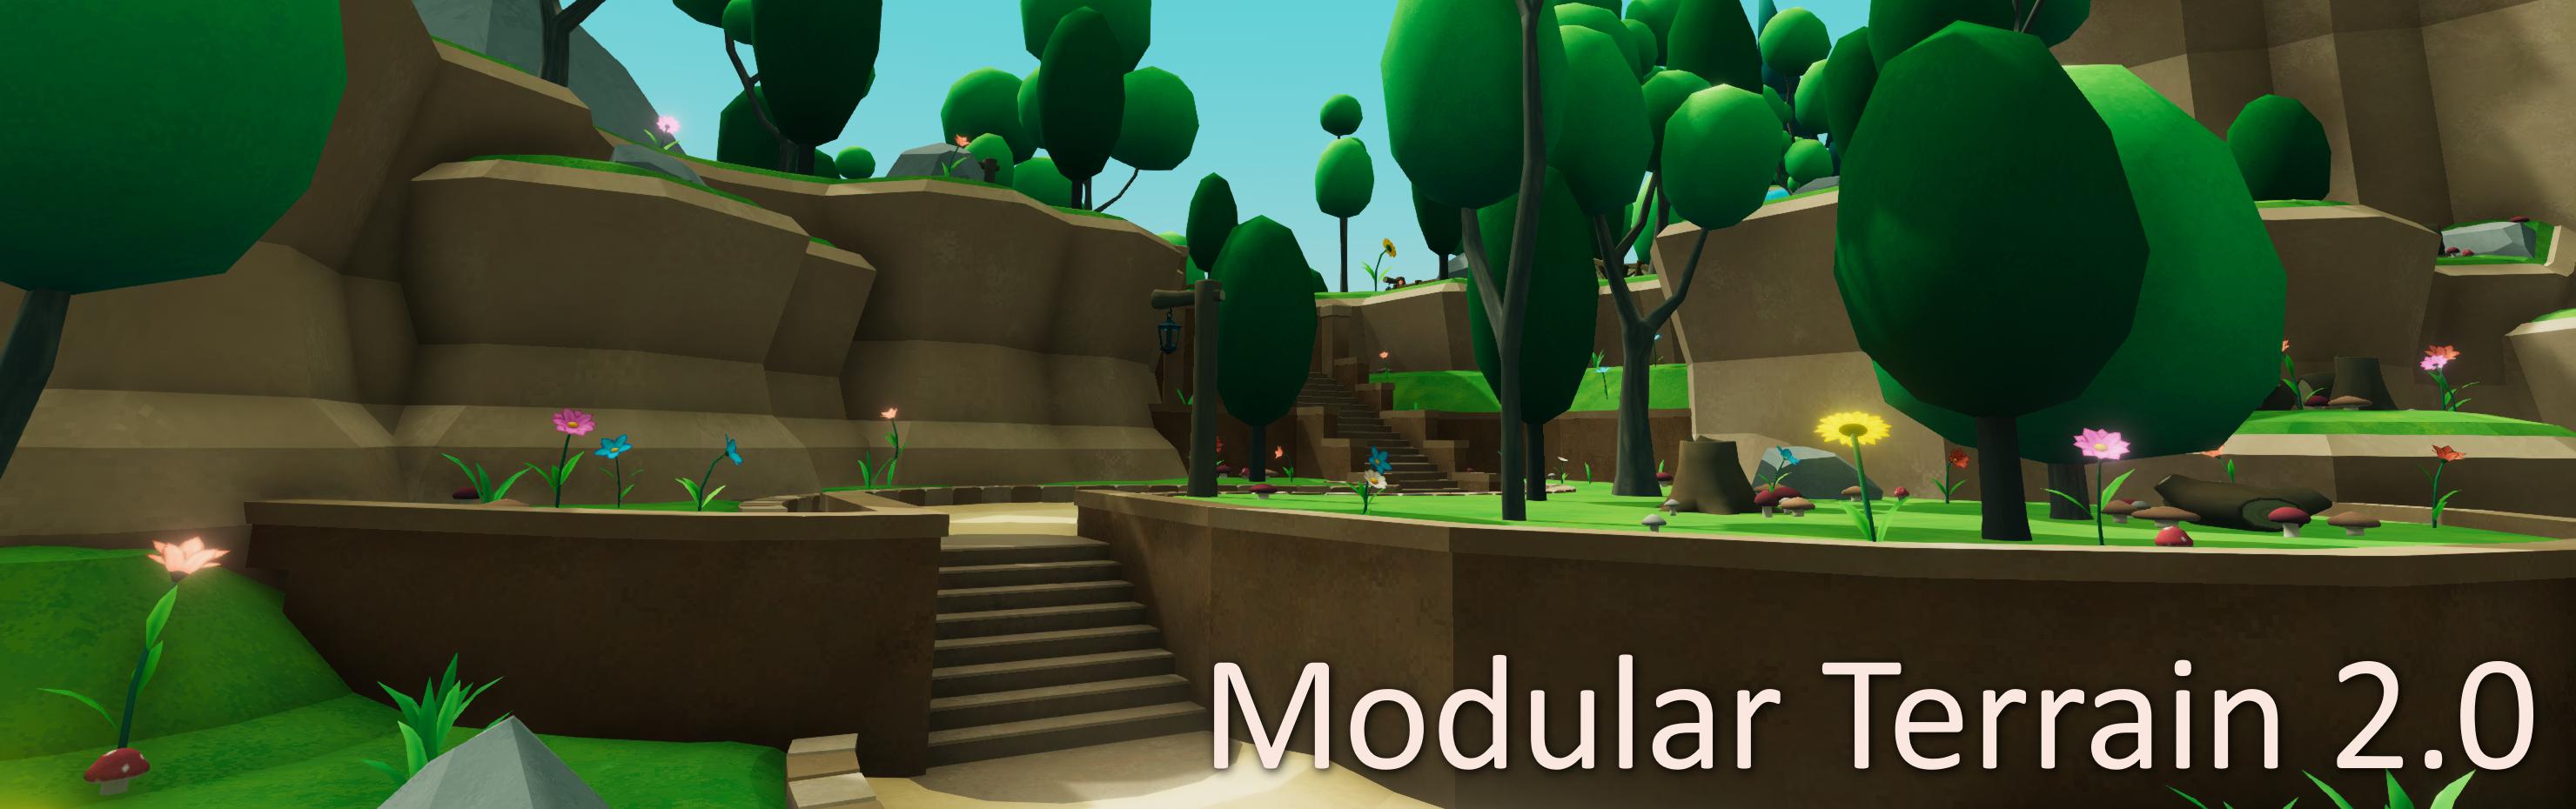 Modular Terrain 2.0